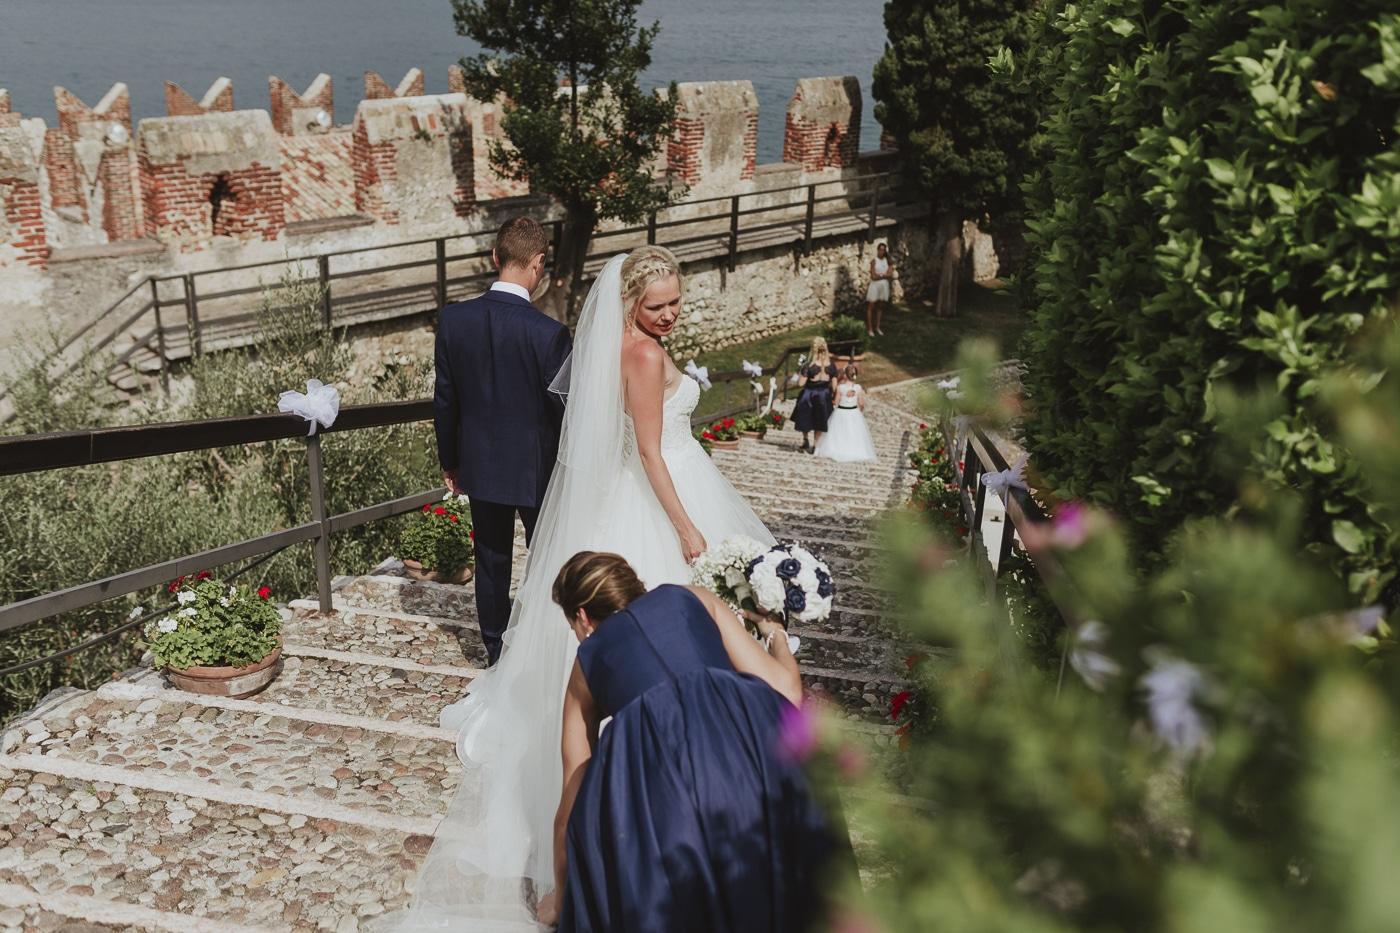 Bridesmaid adjusting brides dress as she and a man walk down stone steps